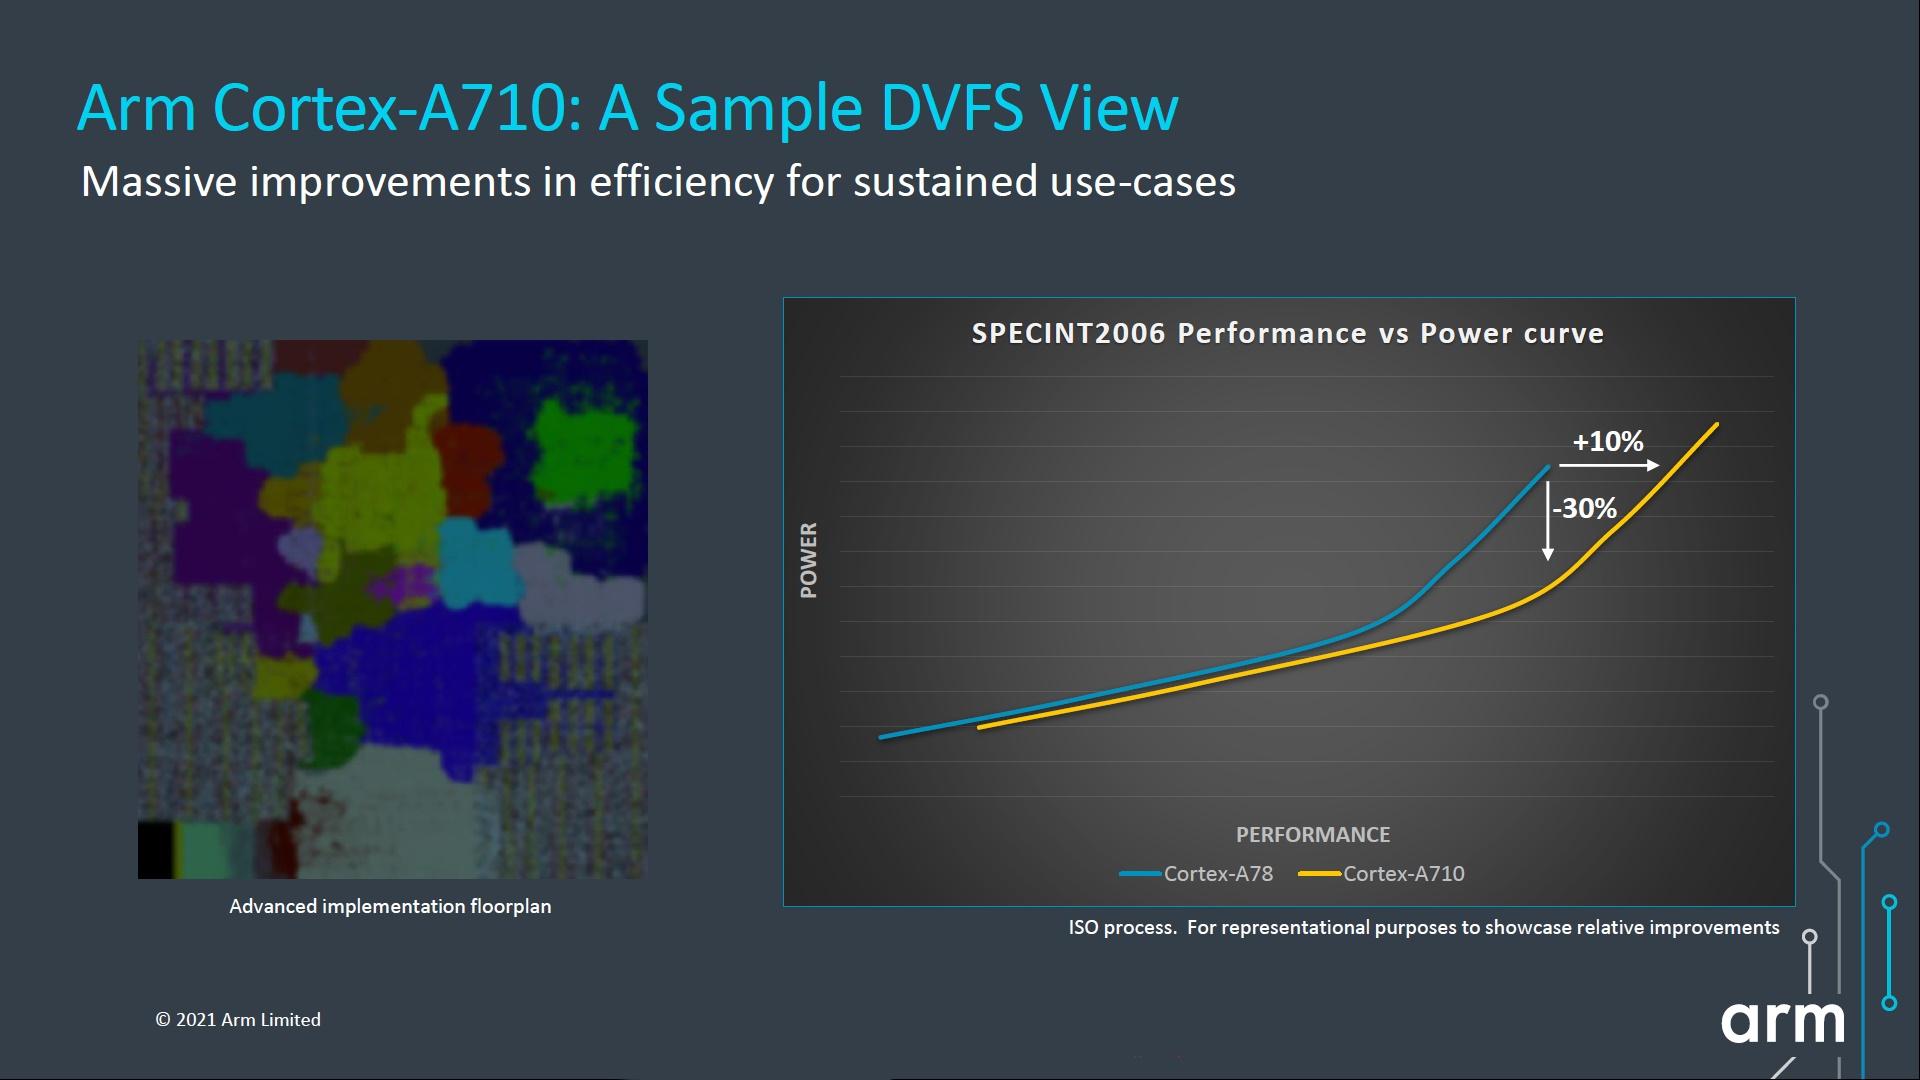 Cortex A710 specint2006 performance vs power